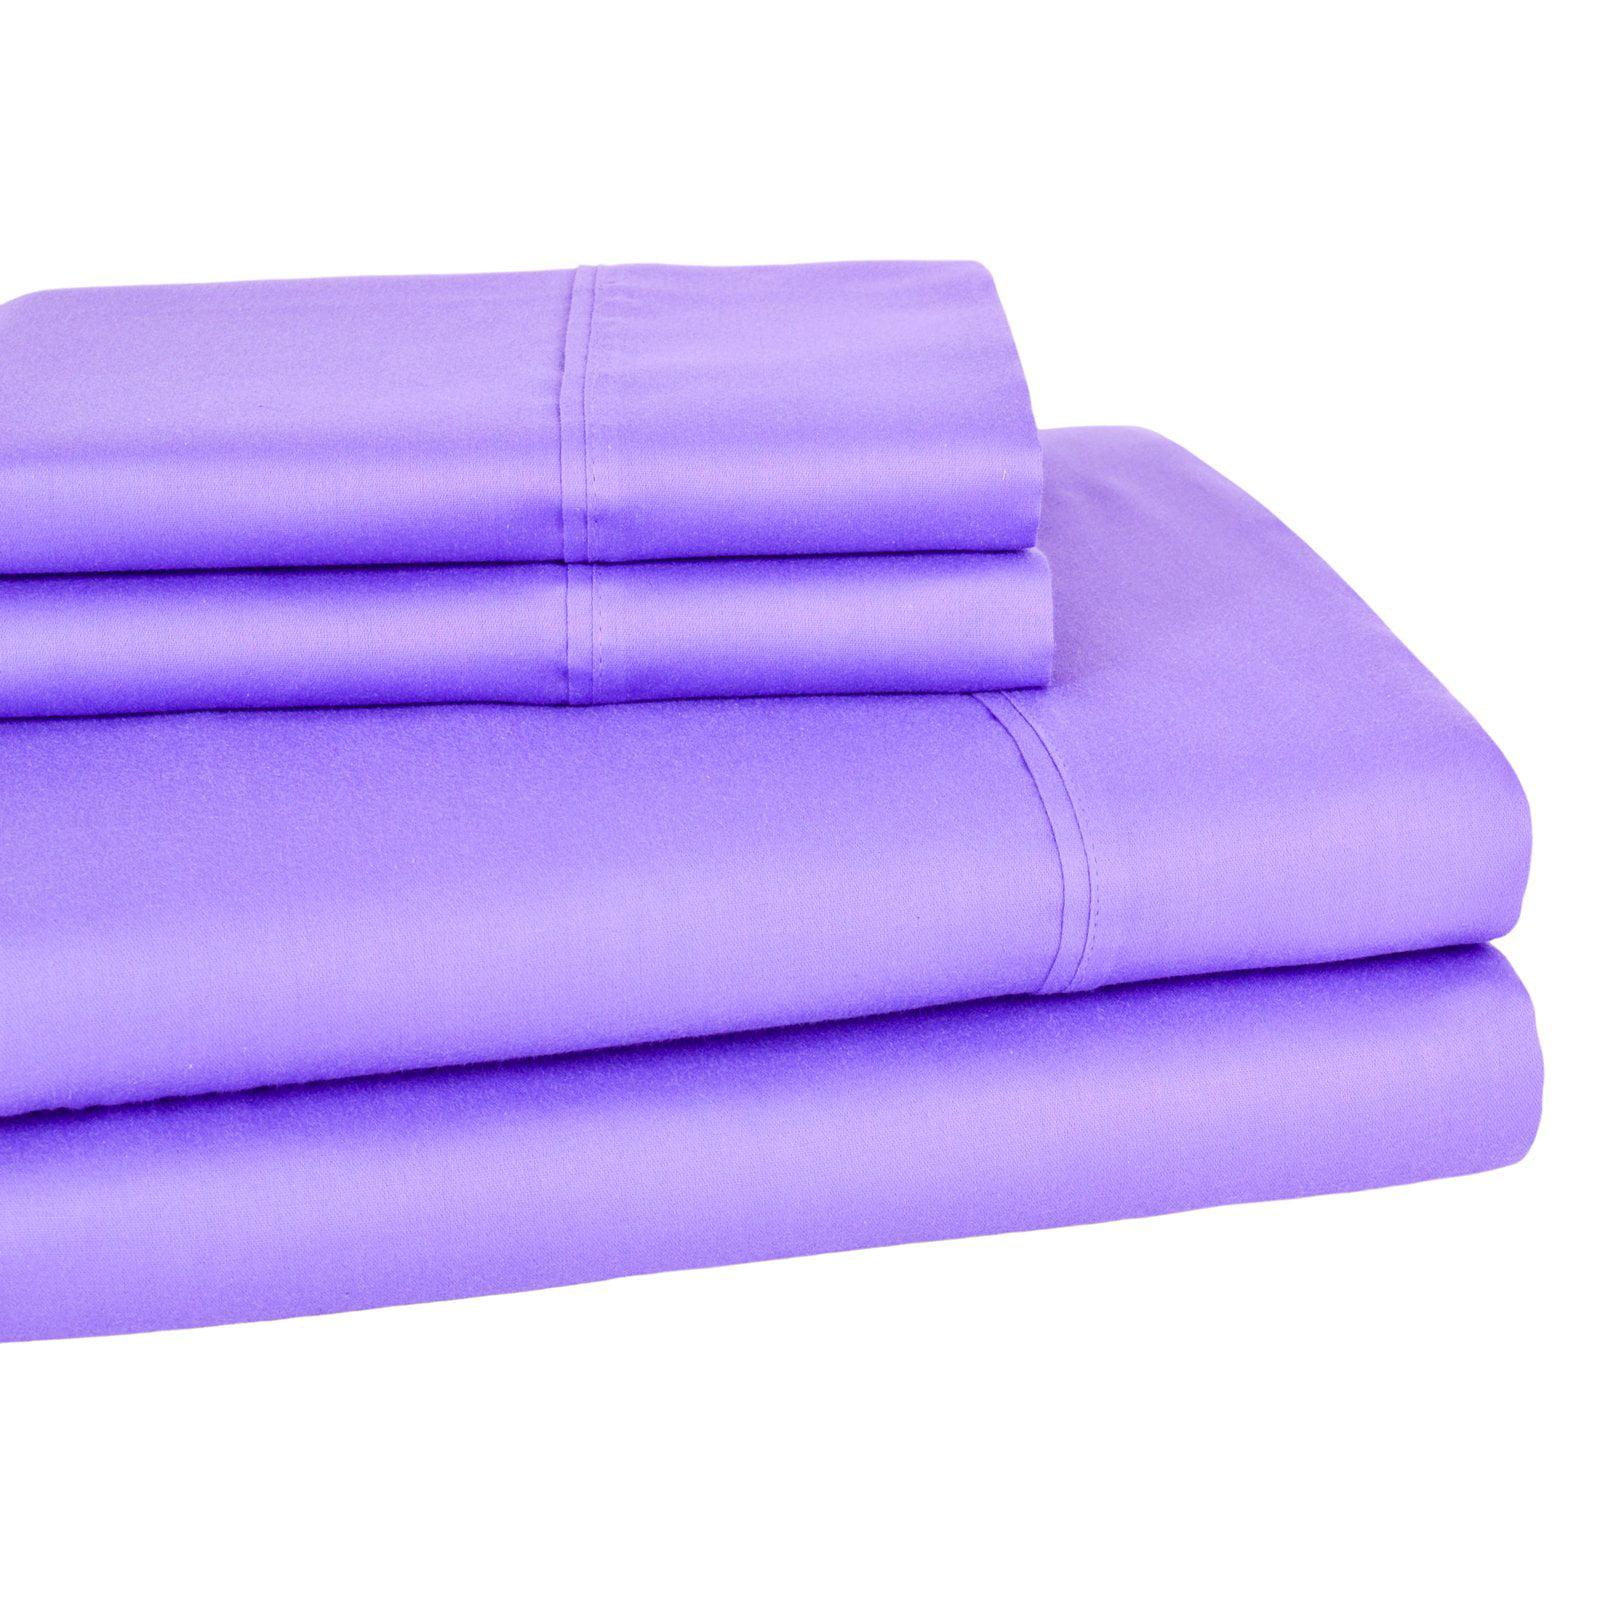 Elite Home 300 Thread Count Wrinkle Resistant Solid Sheet Set